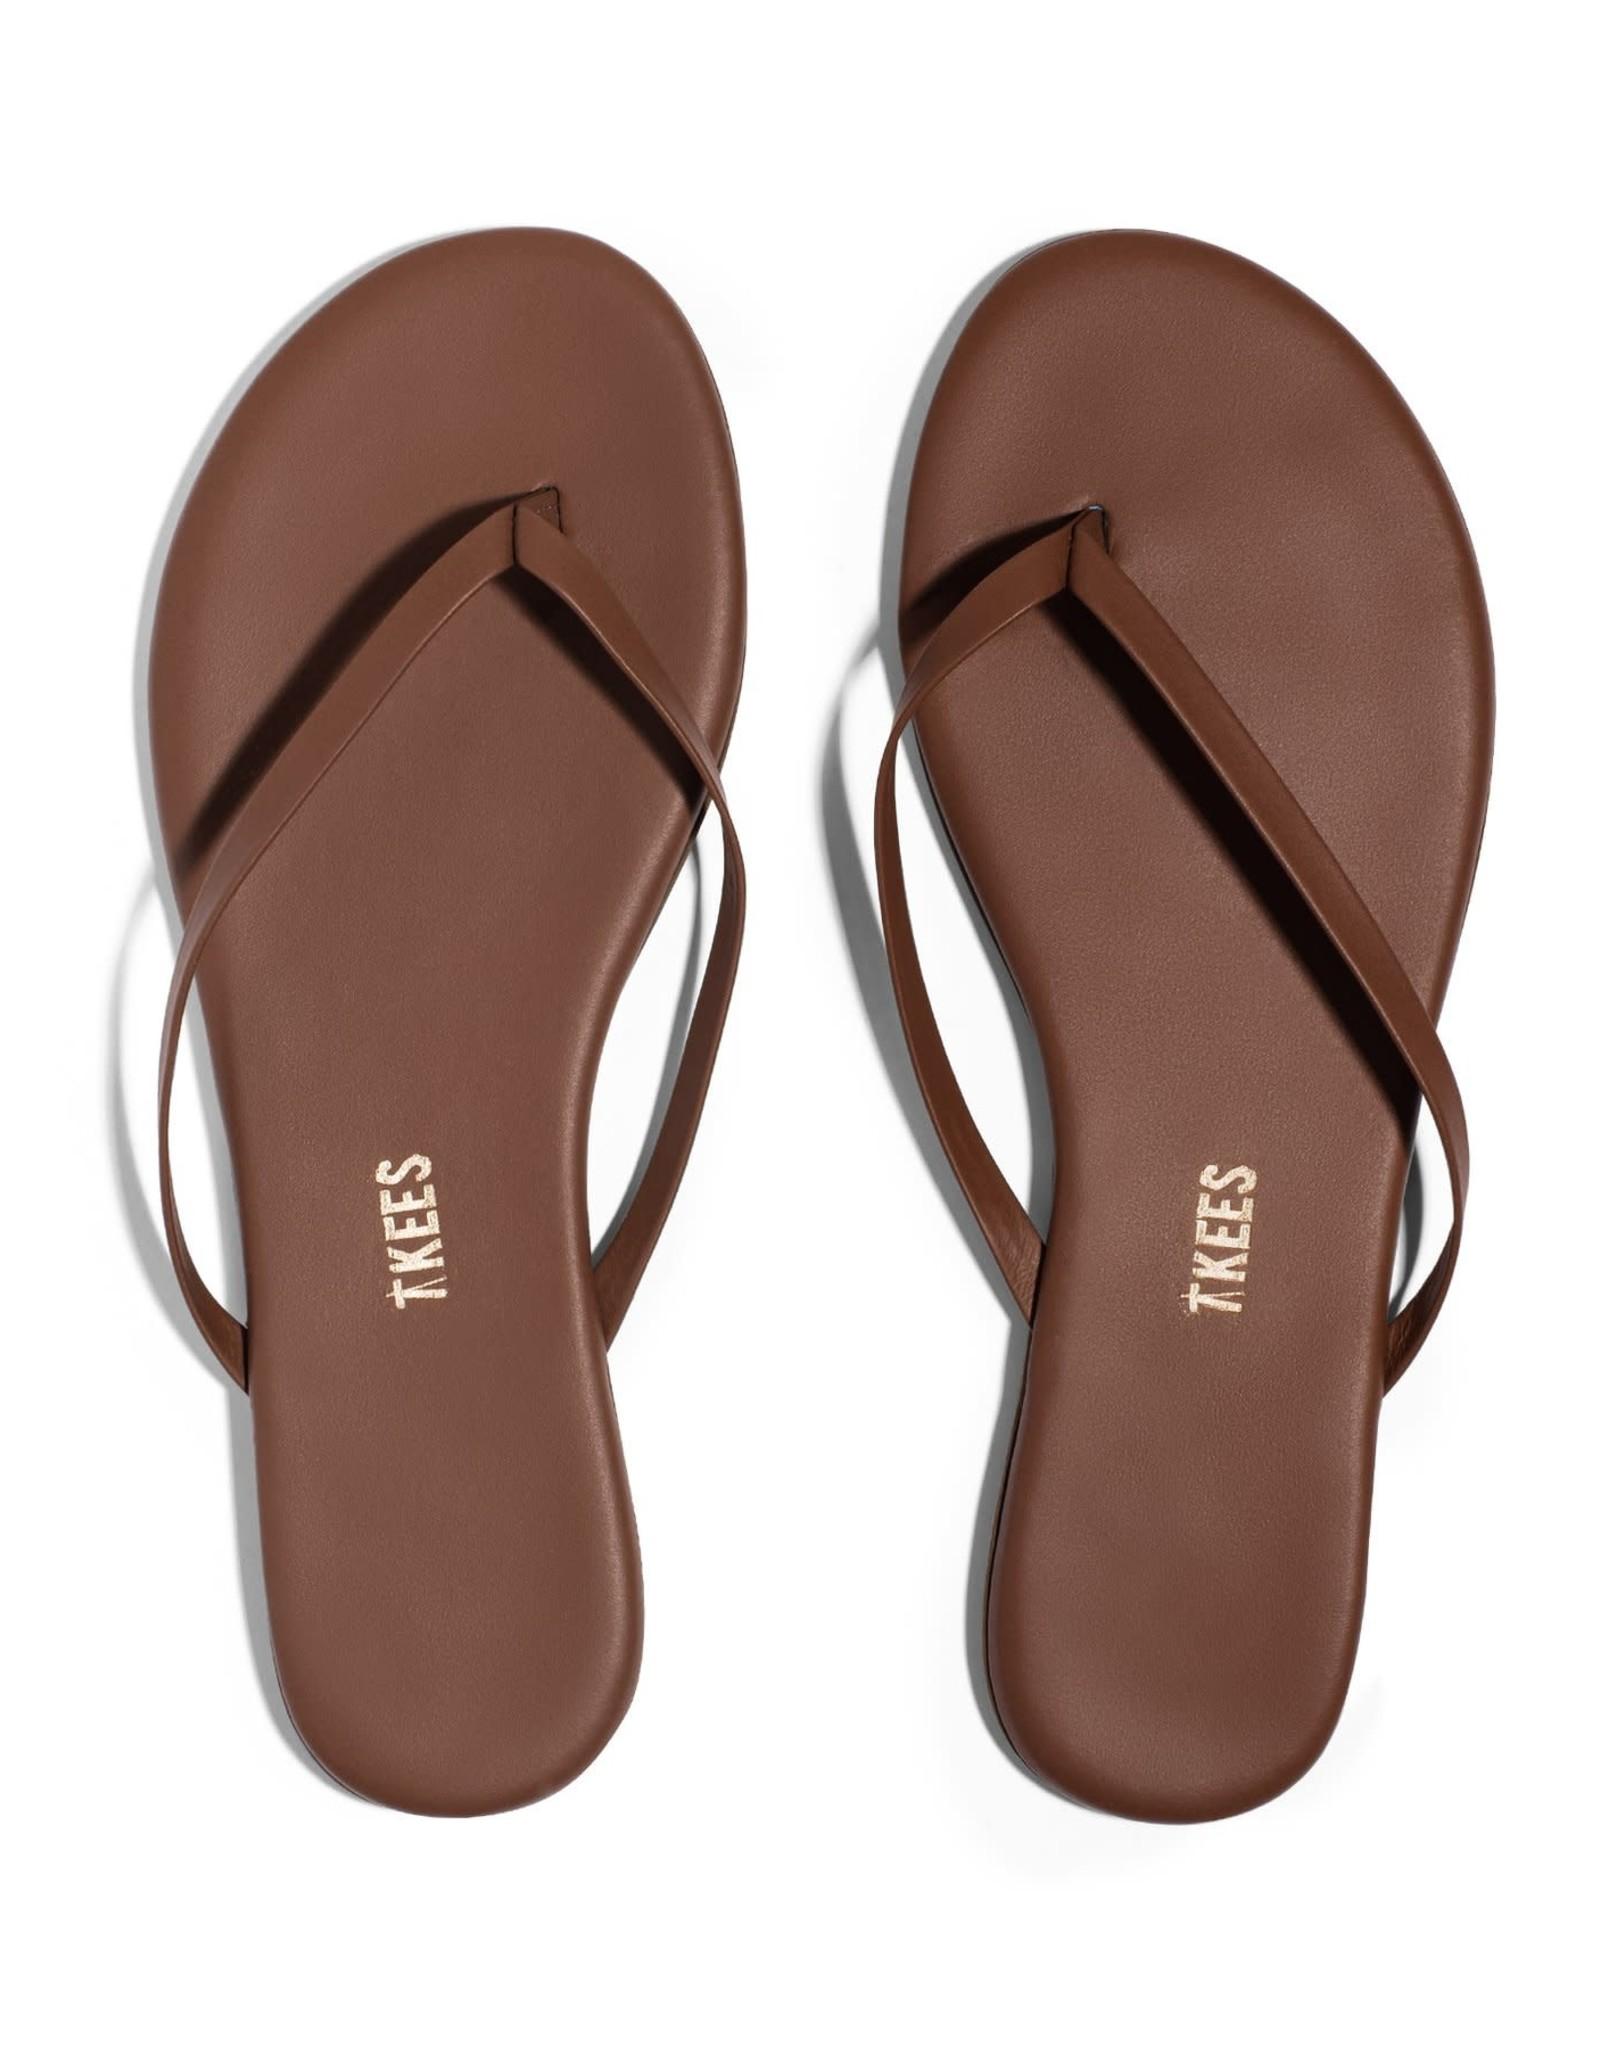 Tkees Foundations Matte Heatwave Sandals